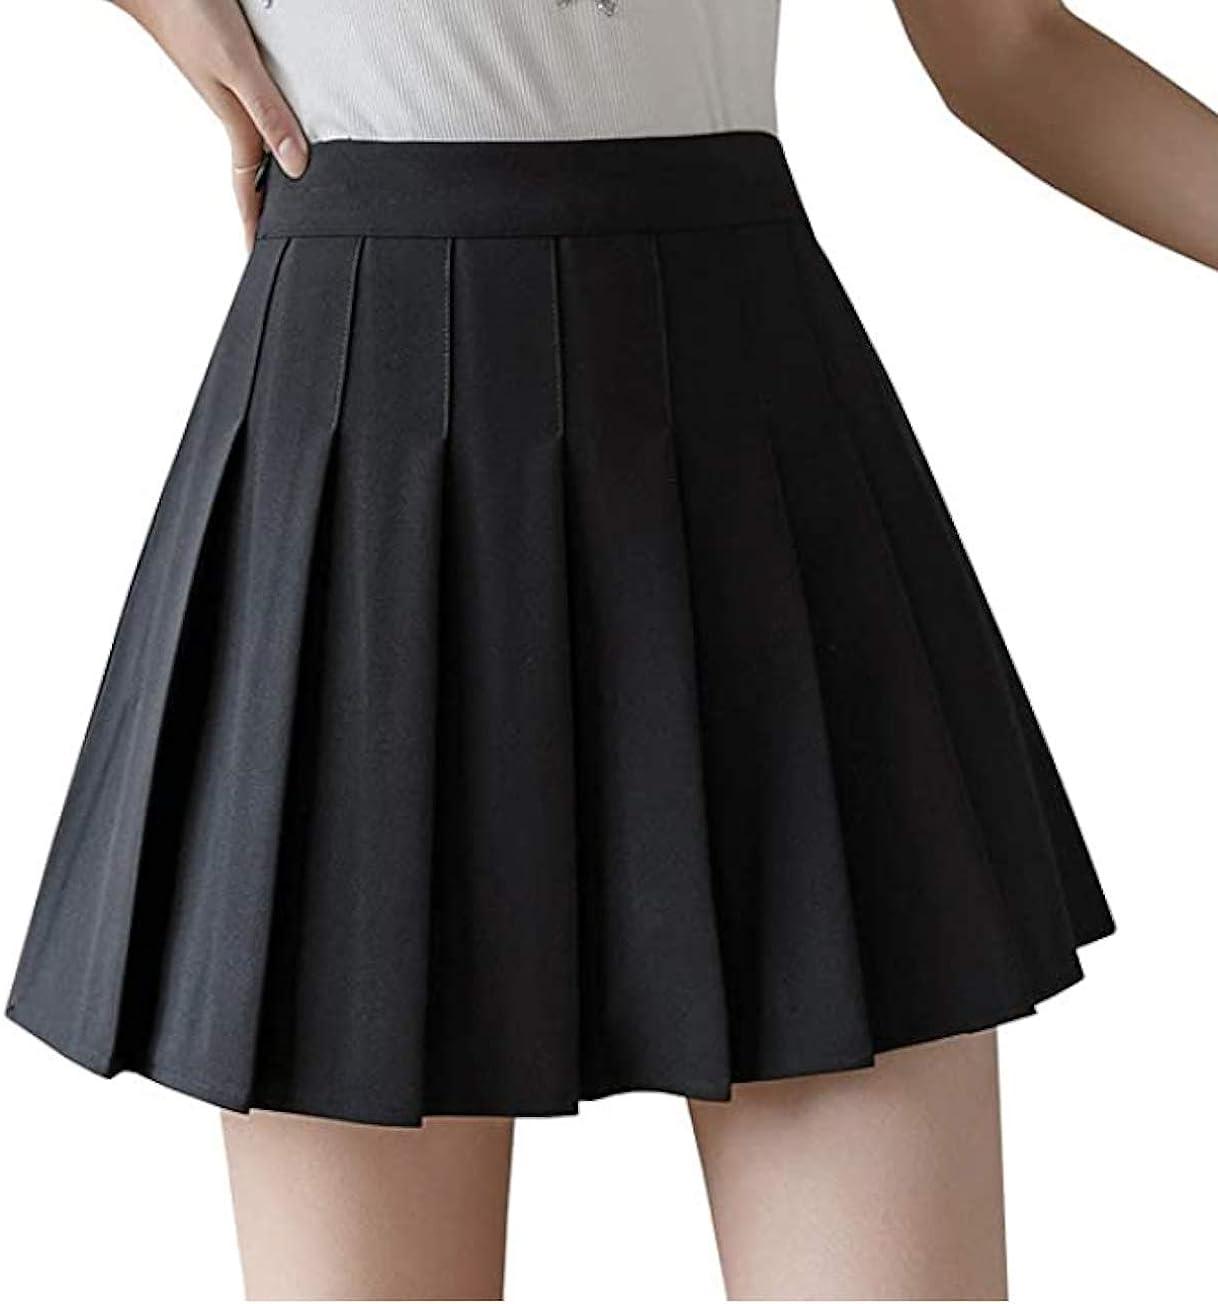 Girls Women High Waisted Plain Tennis Super Max 60% OFF popular specialty store Skirt Skater Schoo Pleated